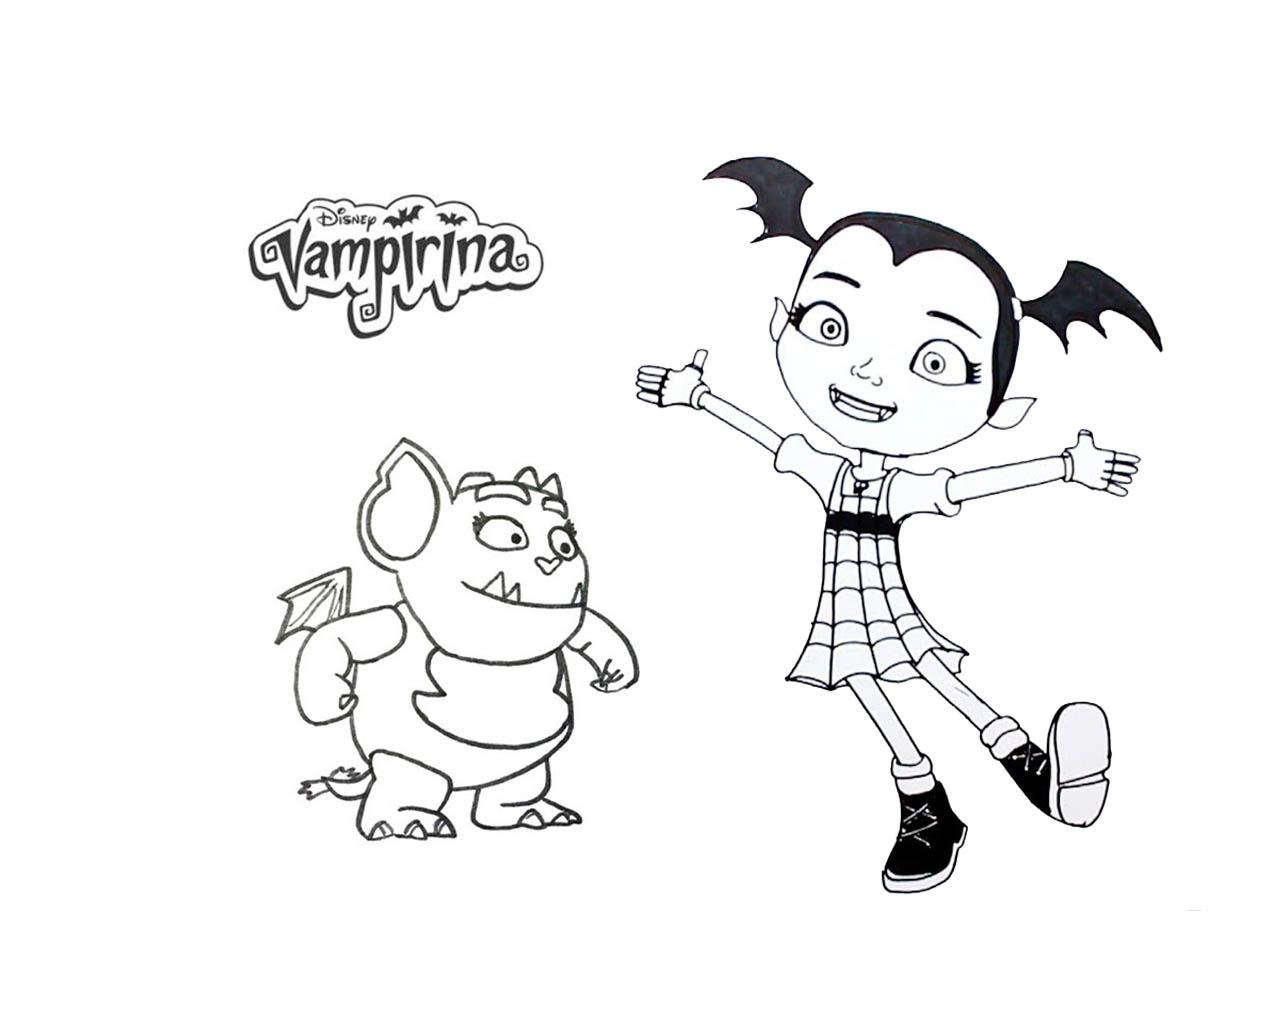 Imagenes De Vampirina Para Colorear